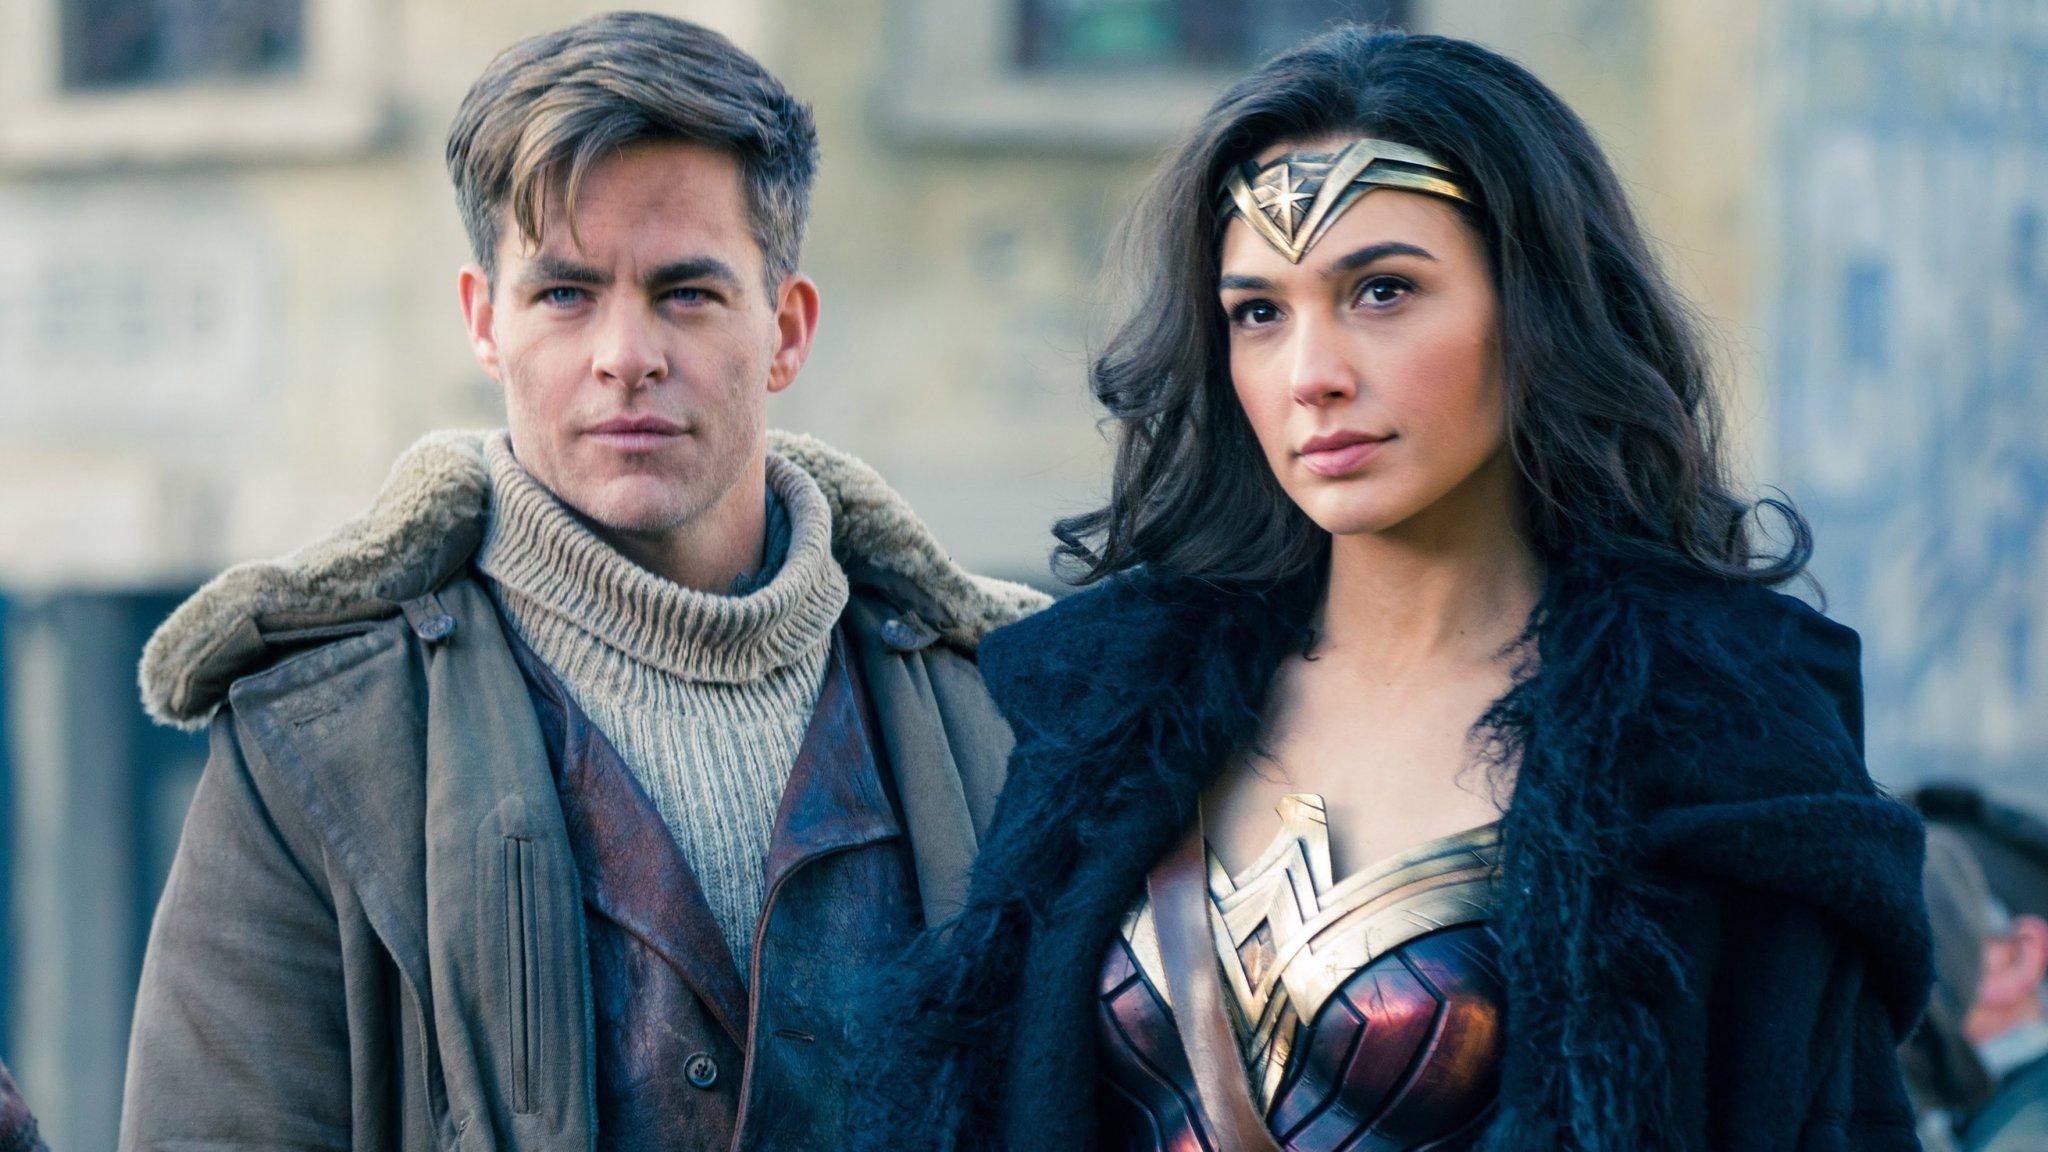 Chris Pine and Gal Gadot in Wonder Woman (2017)